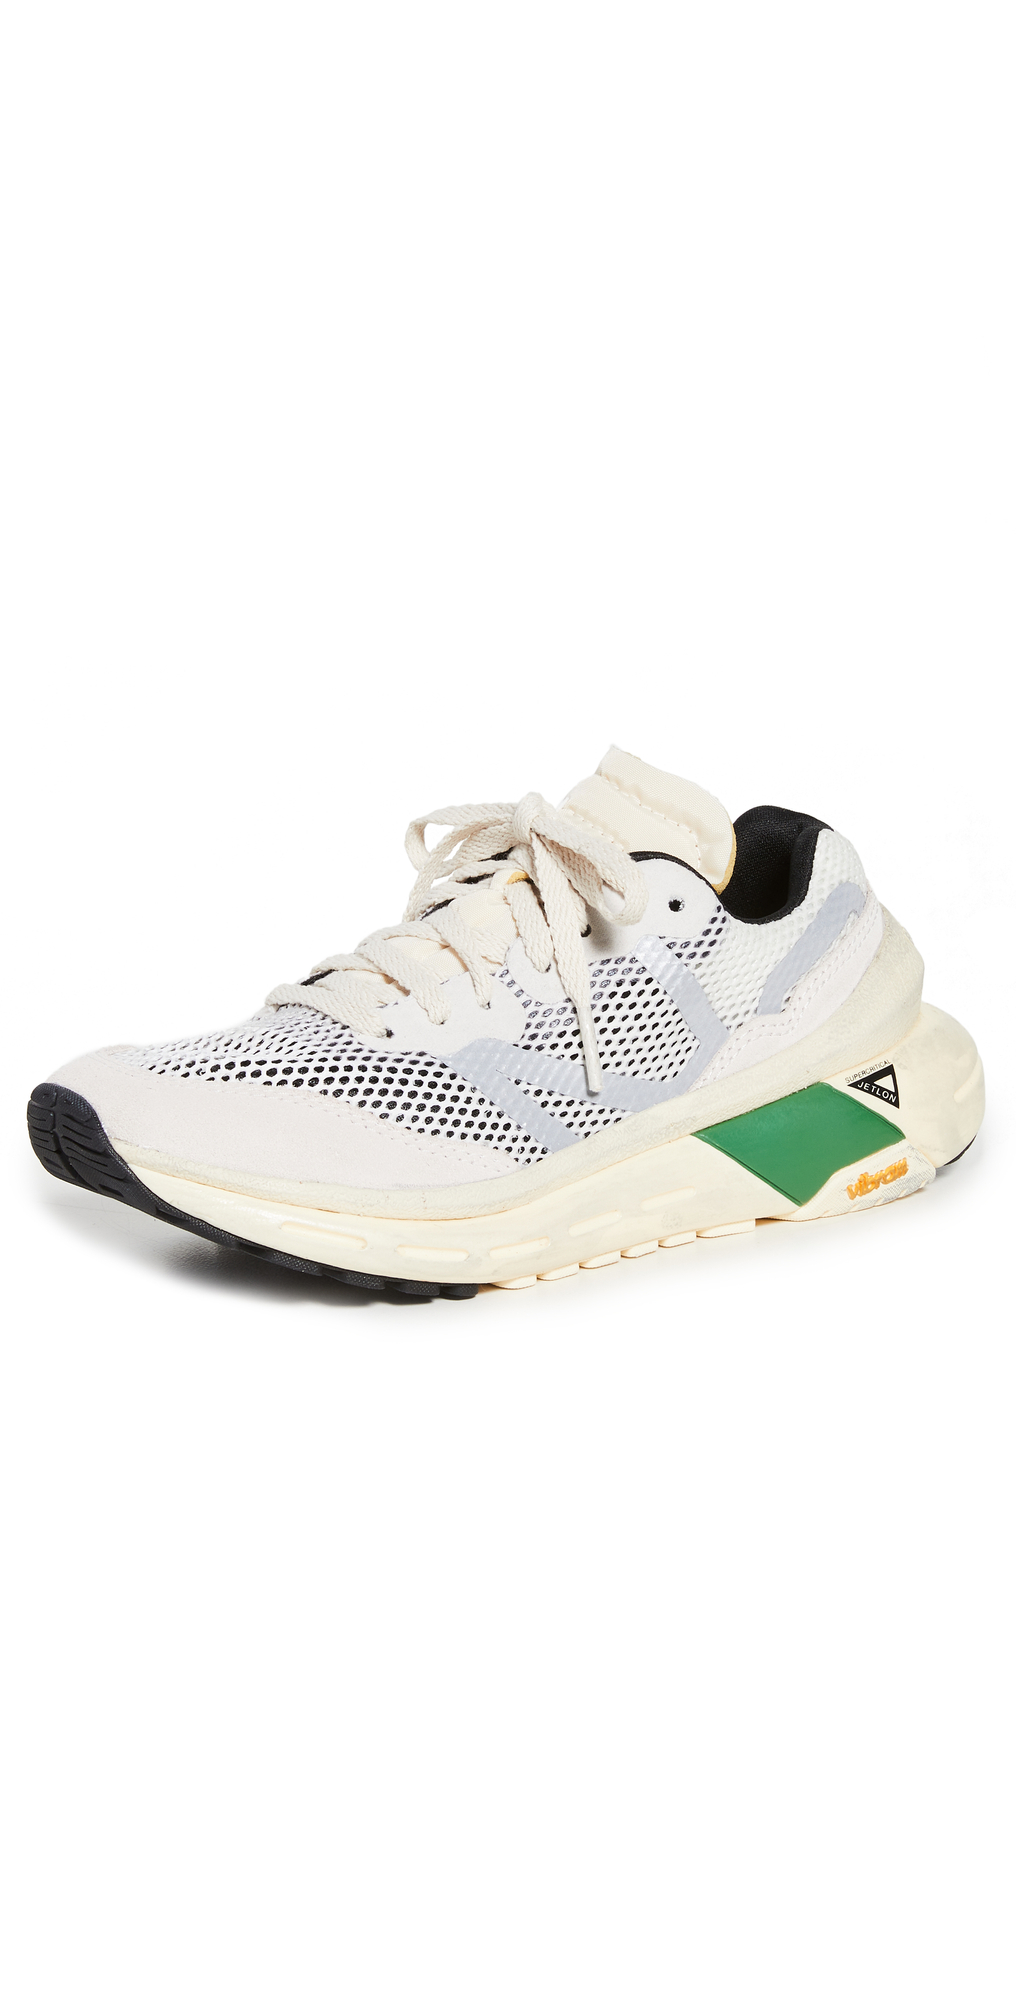 Specter Super Critical Sneakers